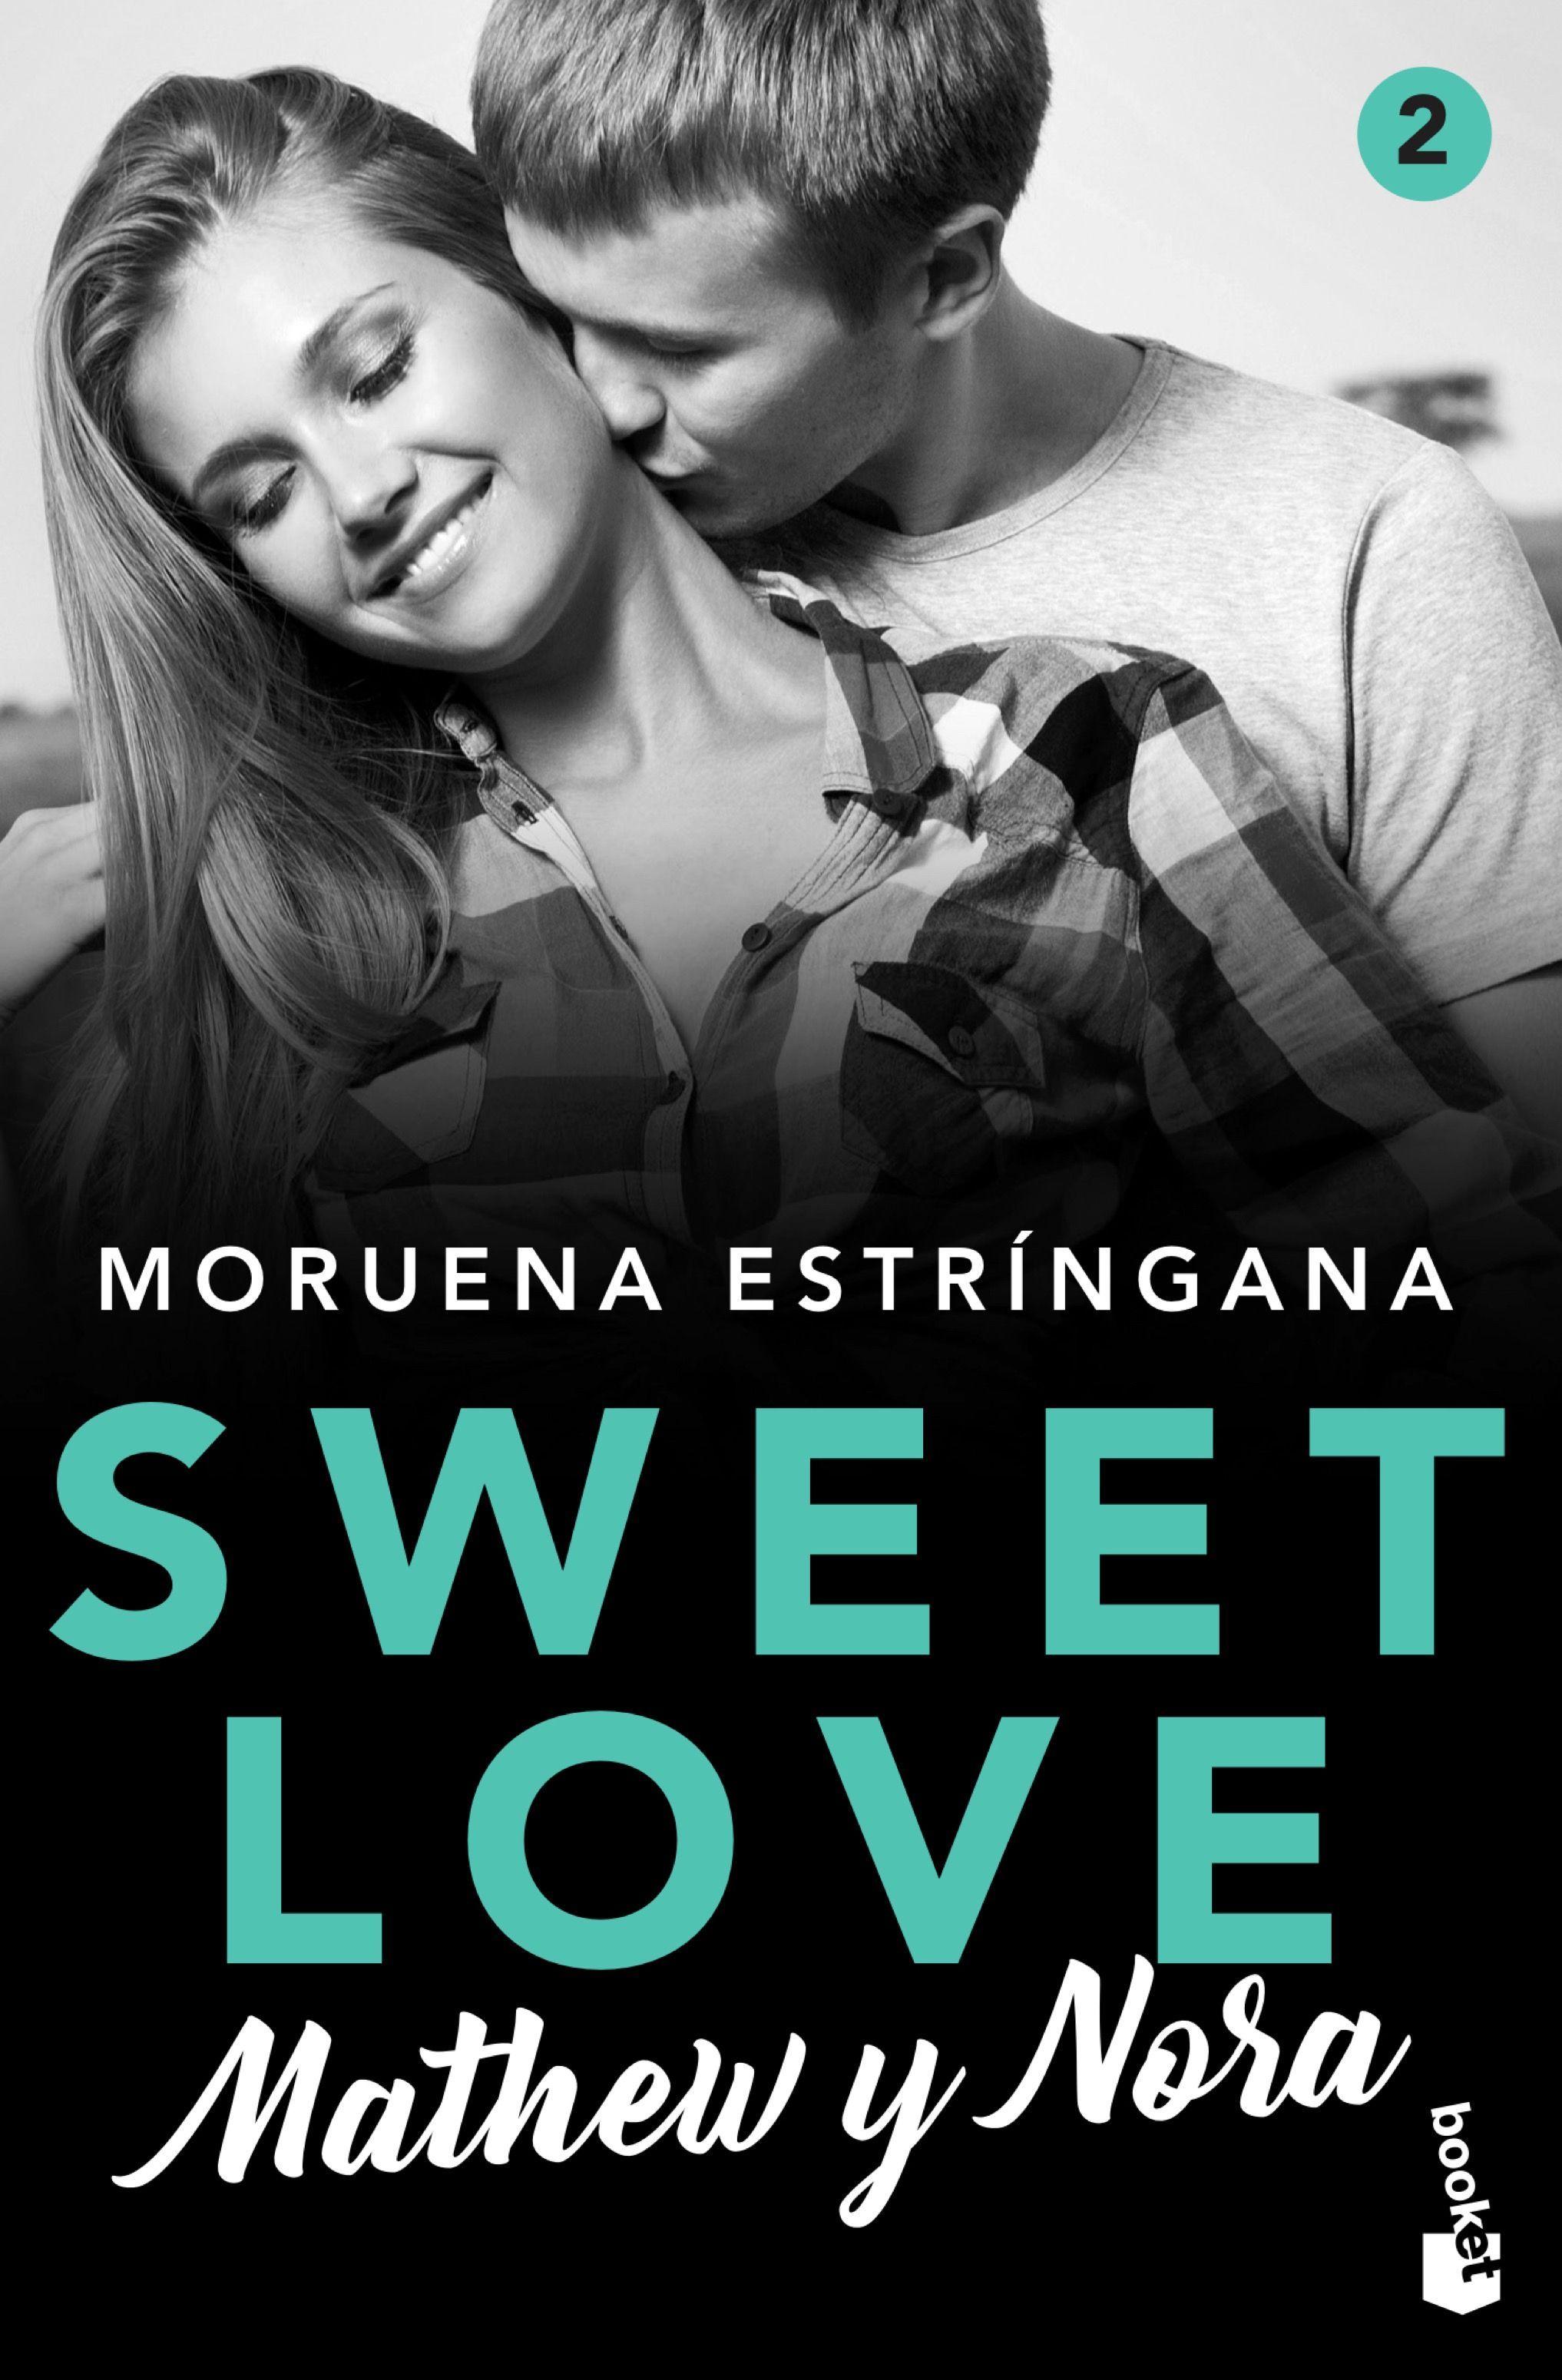 SWEET LOVE 2 MATHEW Y NORA